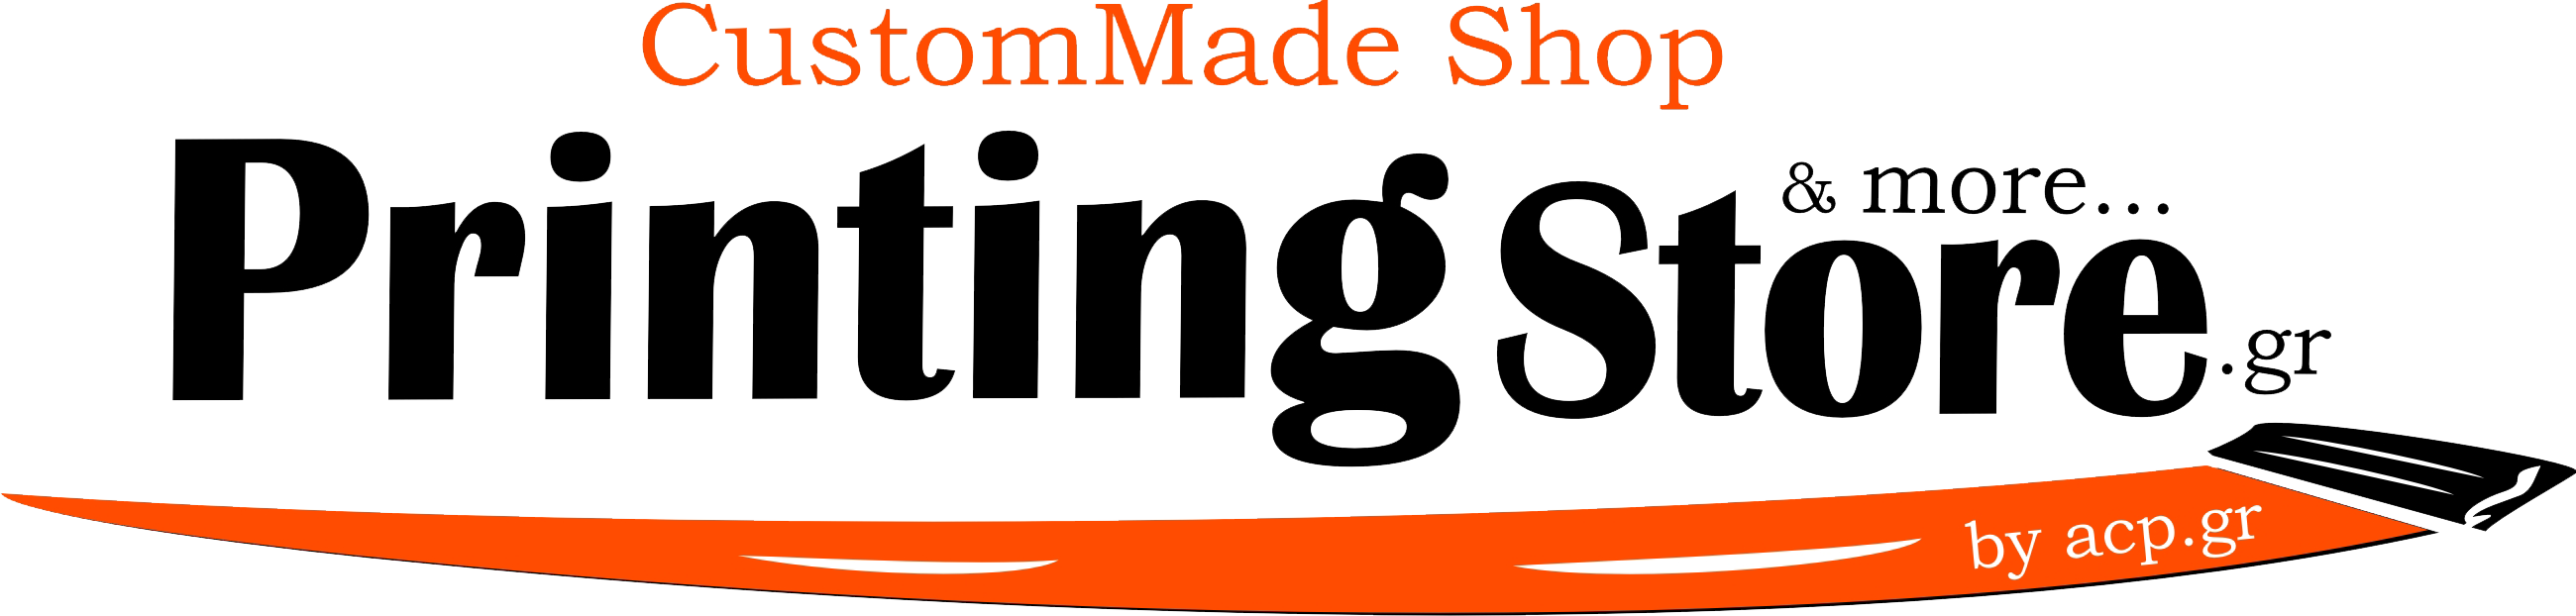 PrintingStore.gr Σταμπάδικο  σχεδίασε σε mπλούζες με στάμπες, κούπες, καπελά, φούτερ και πολλά άλλα